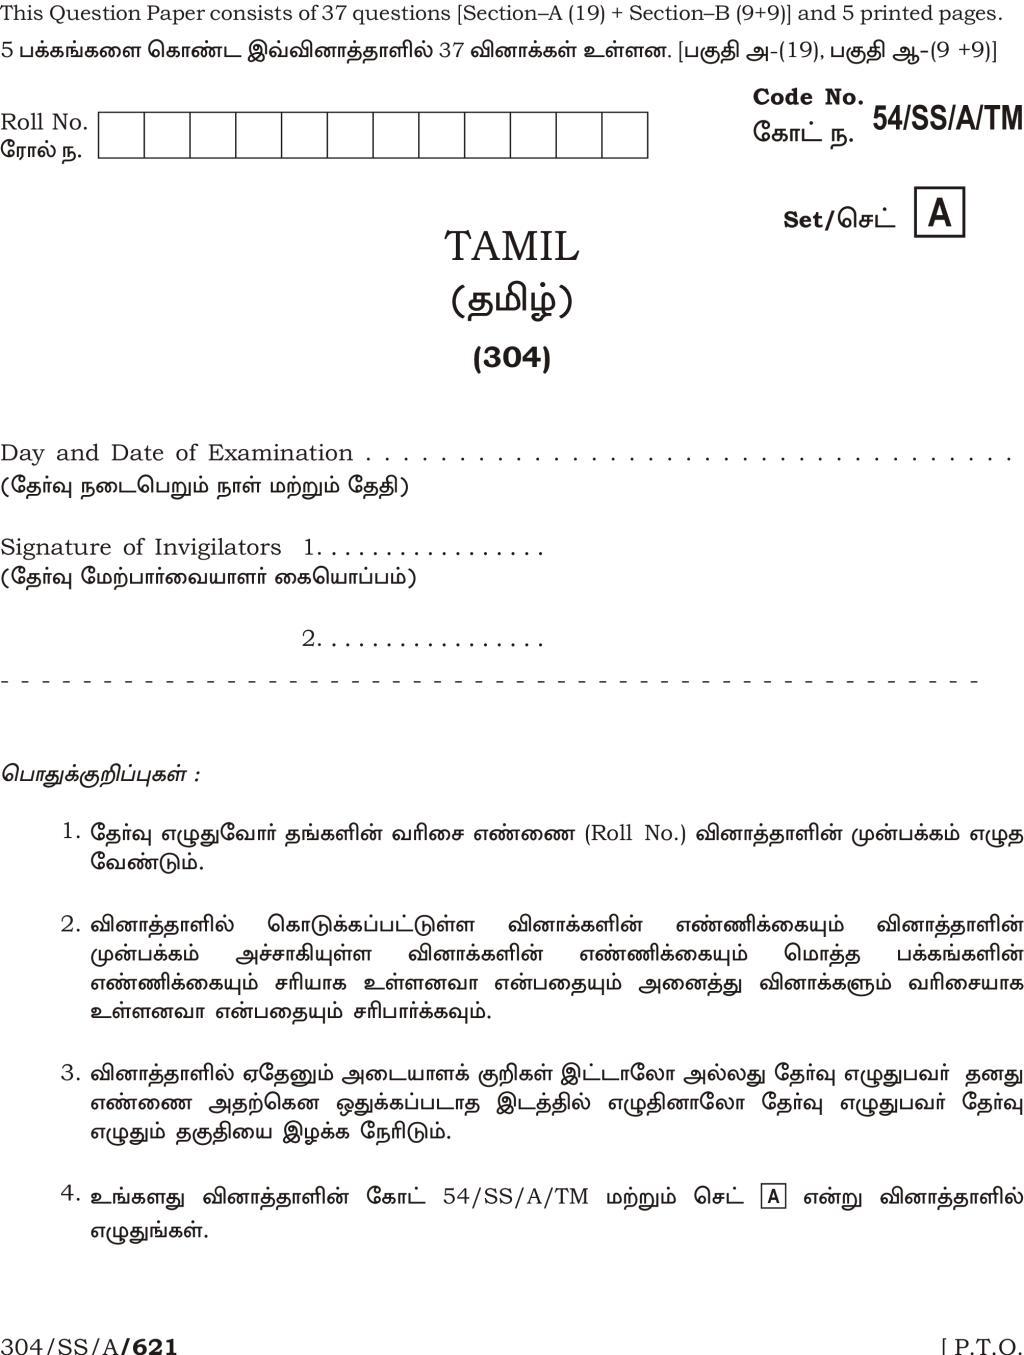 NIOS Class 12 Question Paper Apr 2017 - Tamil - Page 1